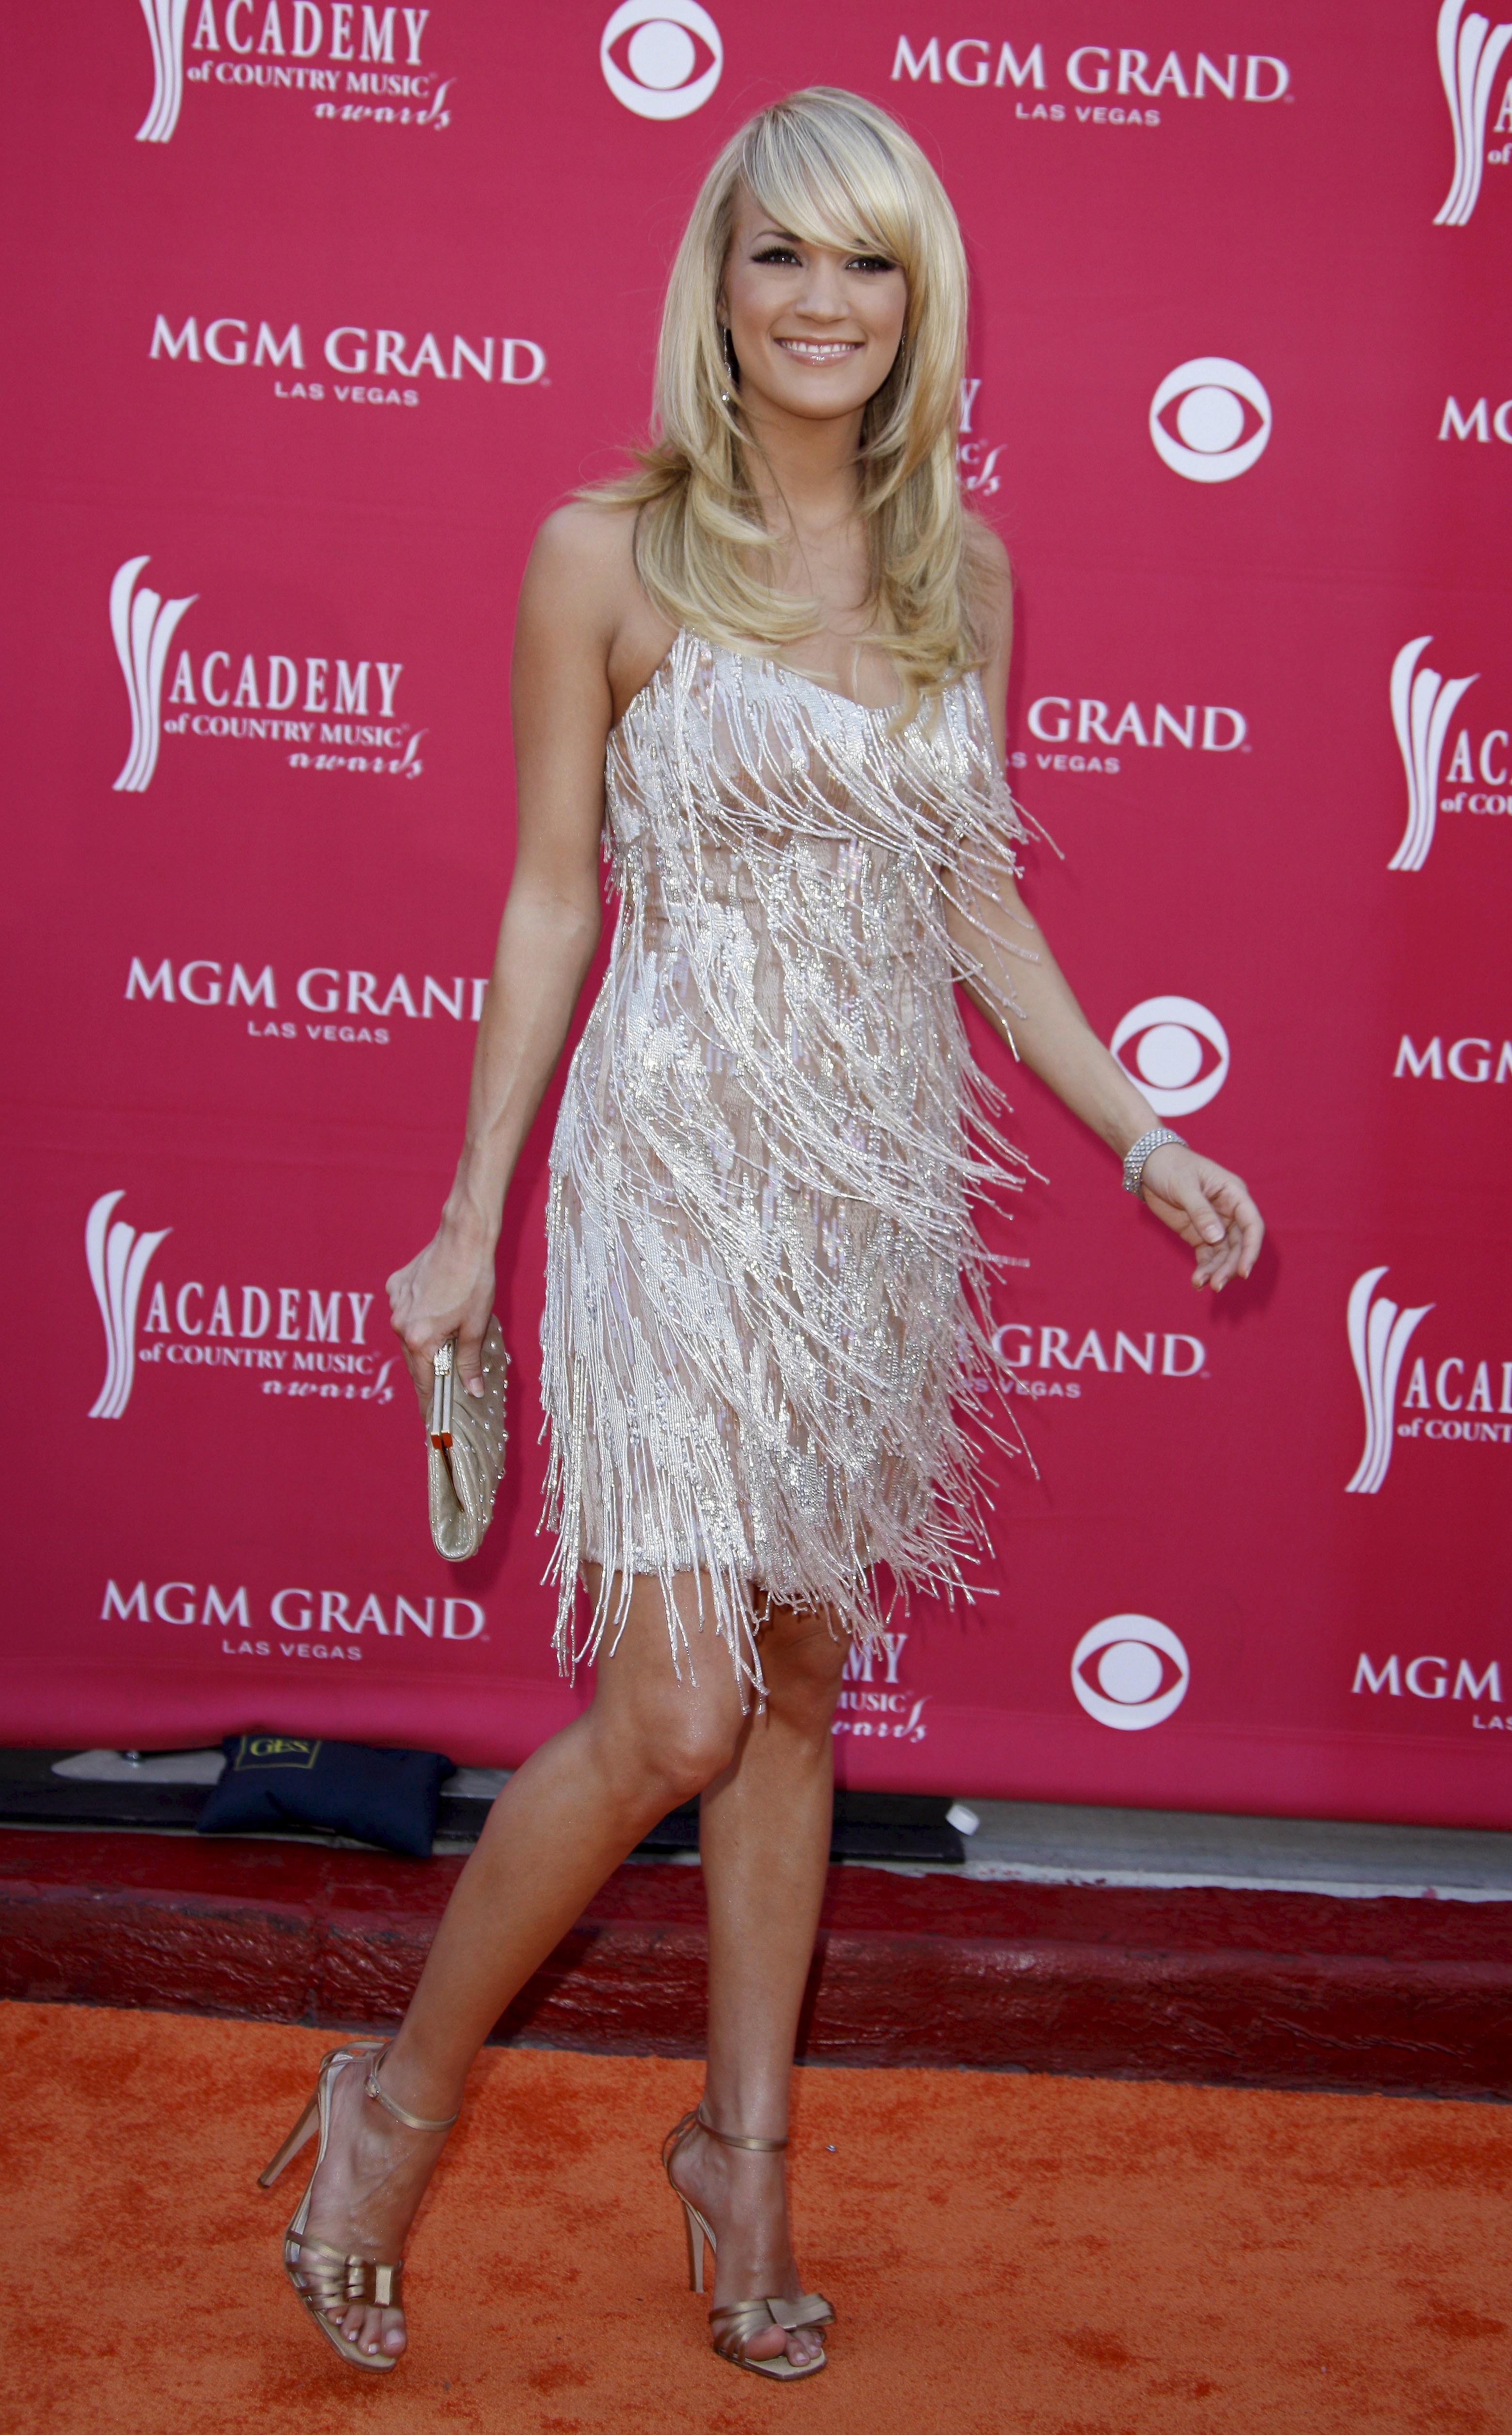 2008: Carrie Underwood